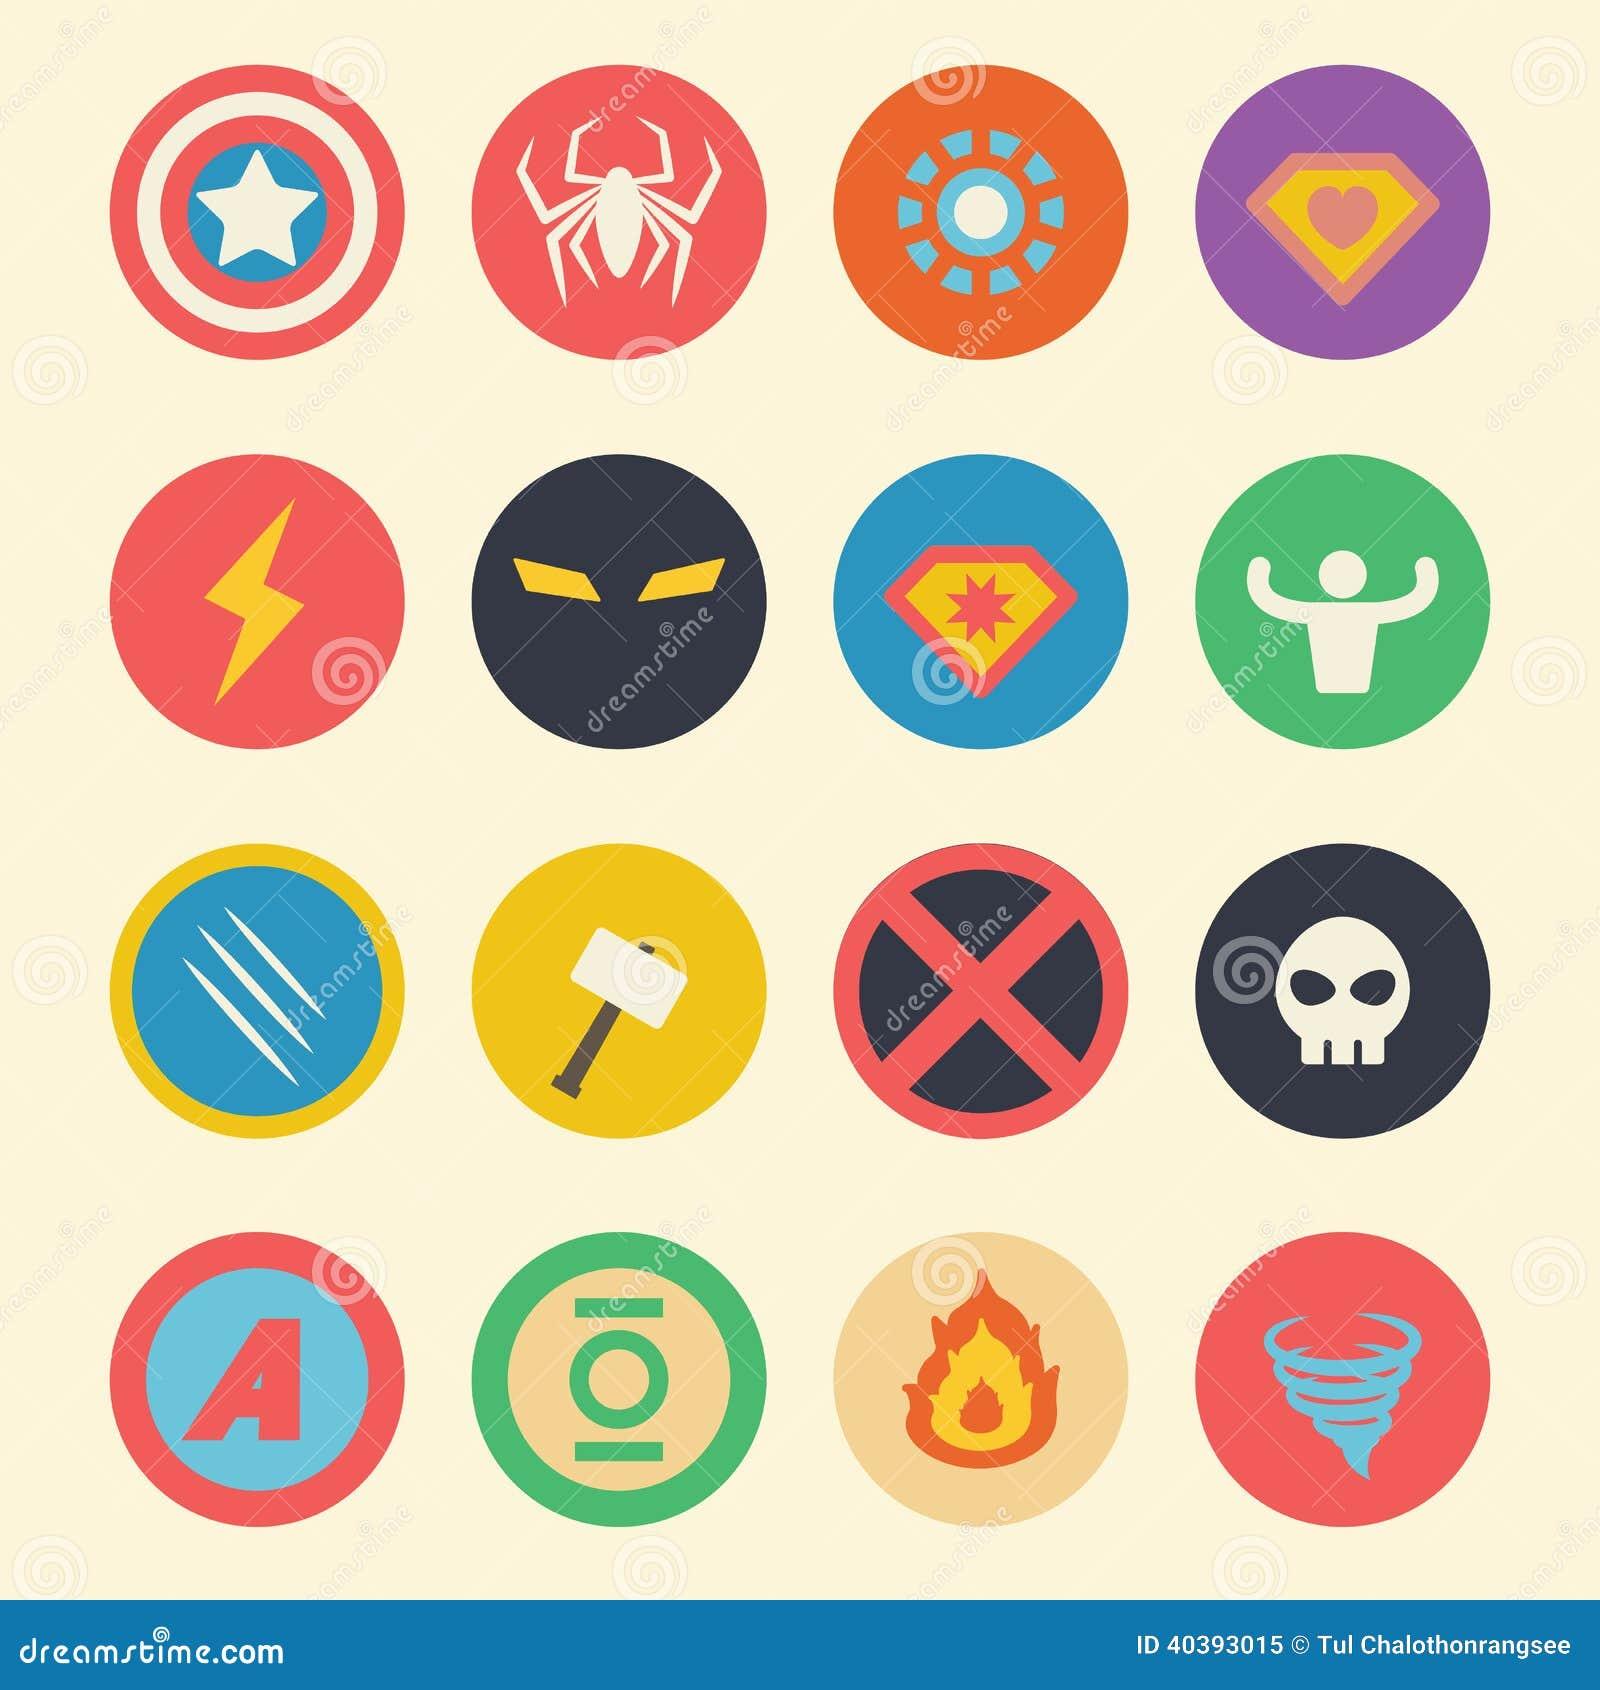 Superhero Flat Icons Stock Vector Illustration Of Flat 40393015